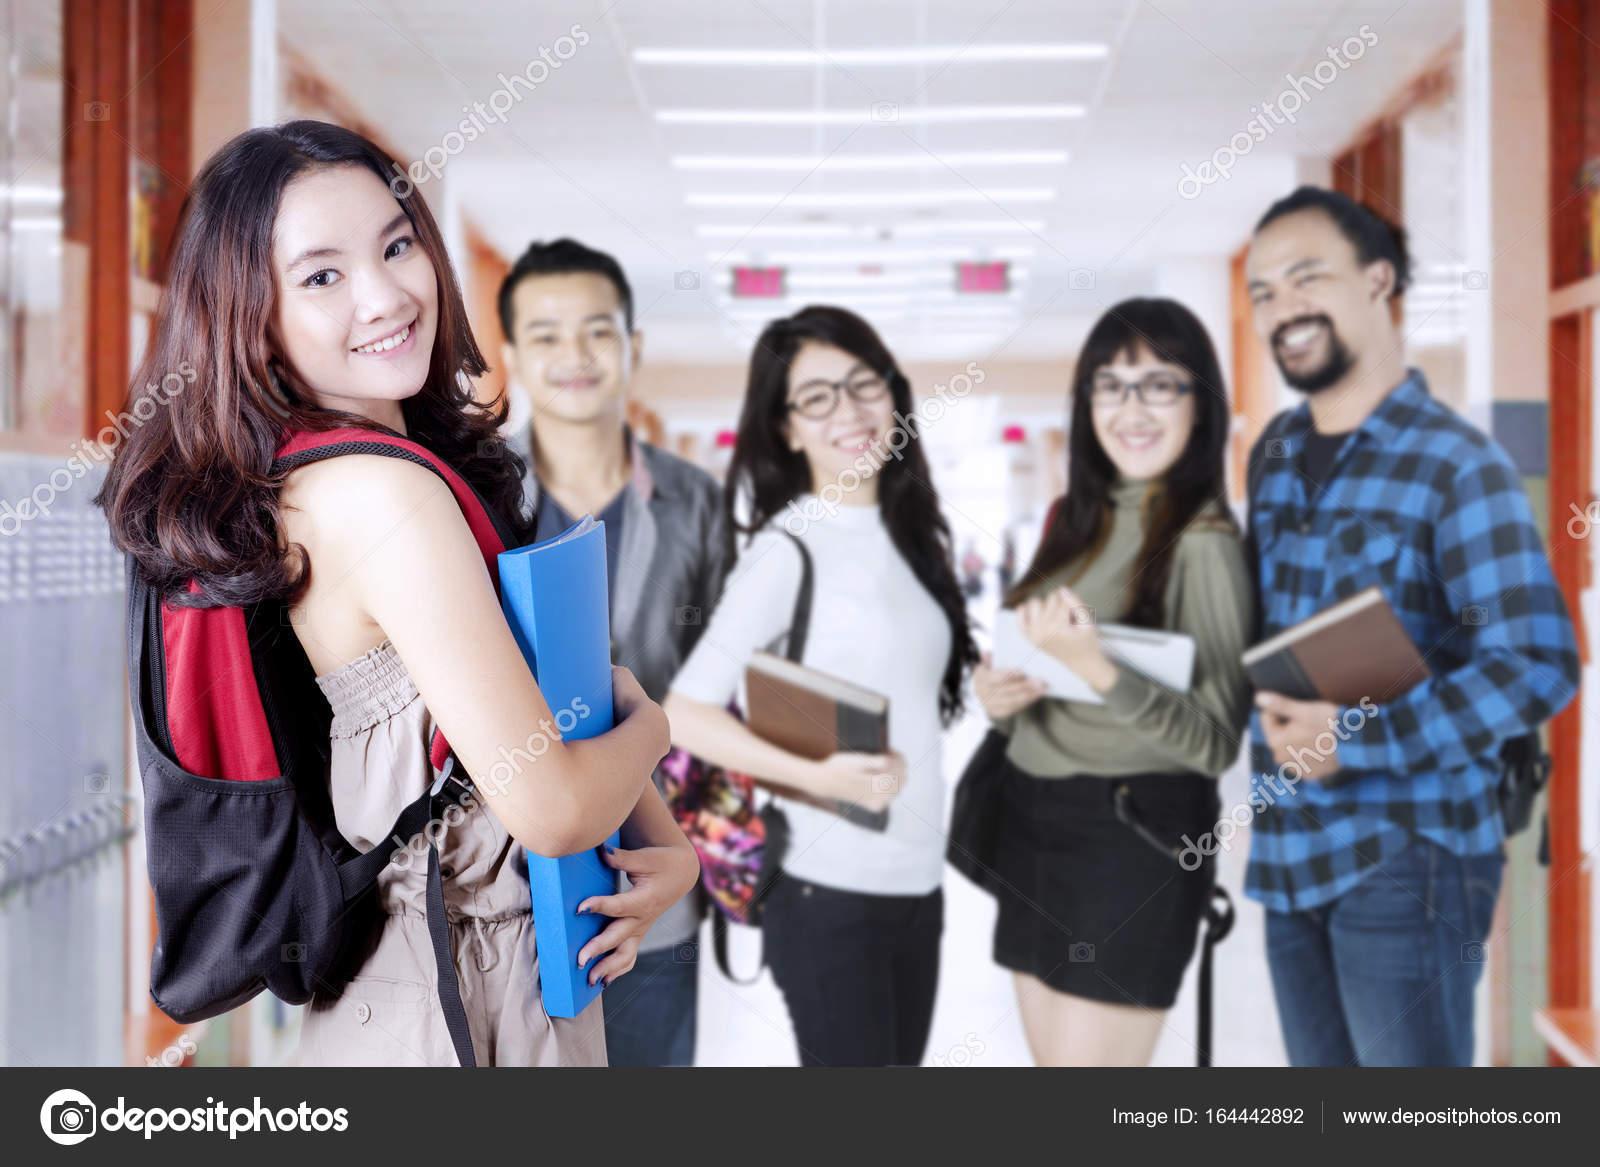 College Friend Meets Girl